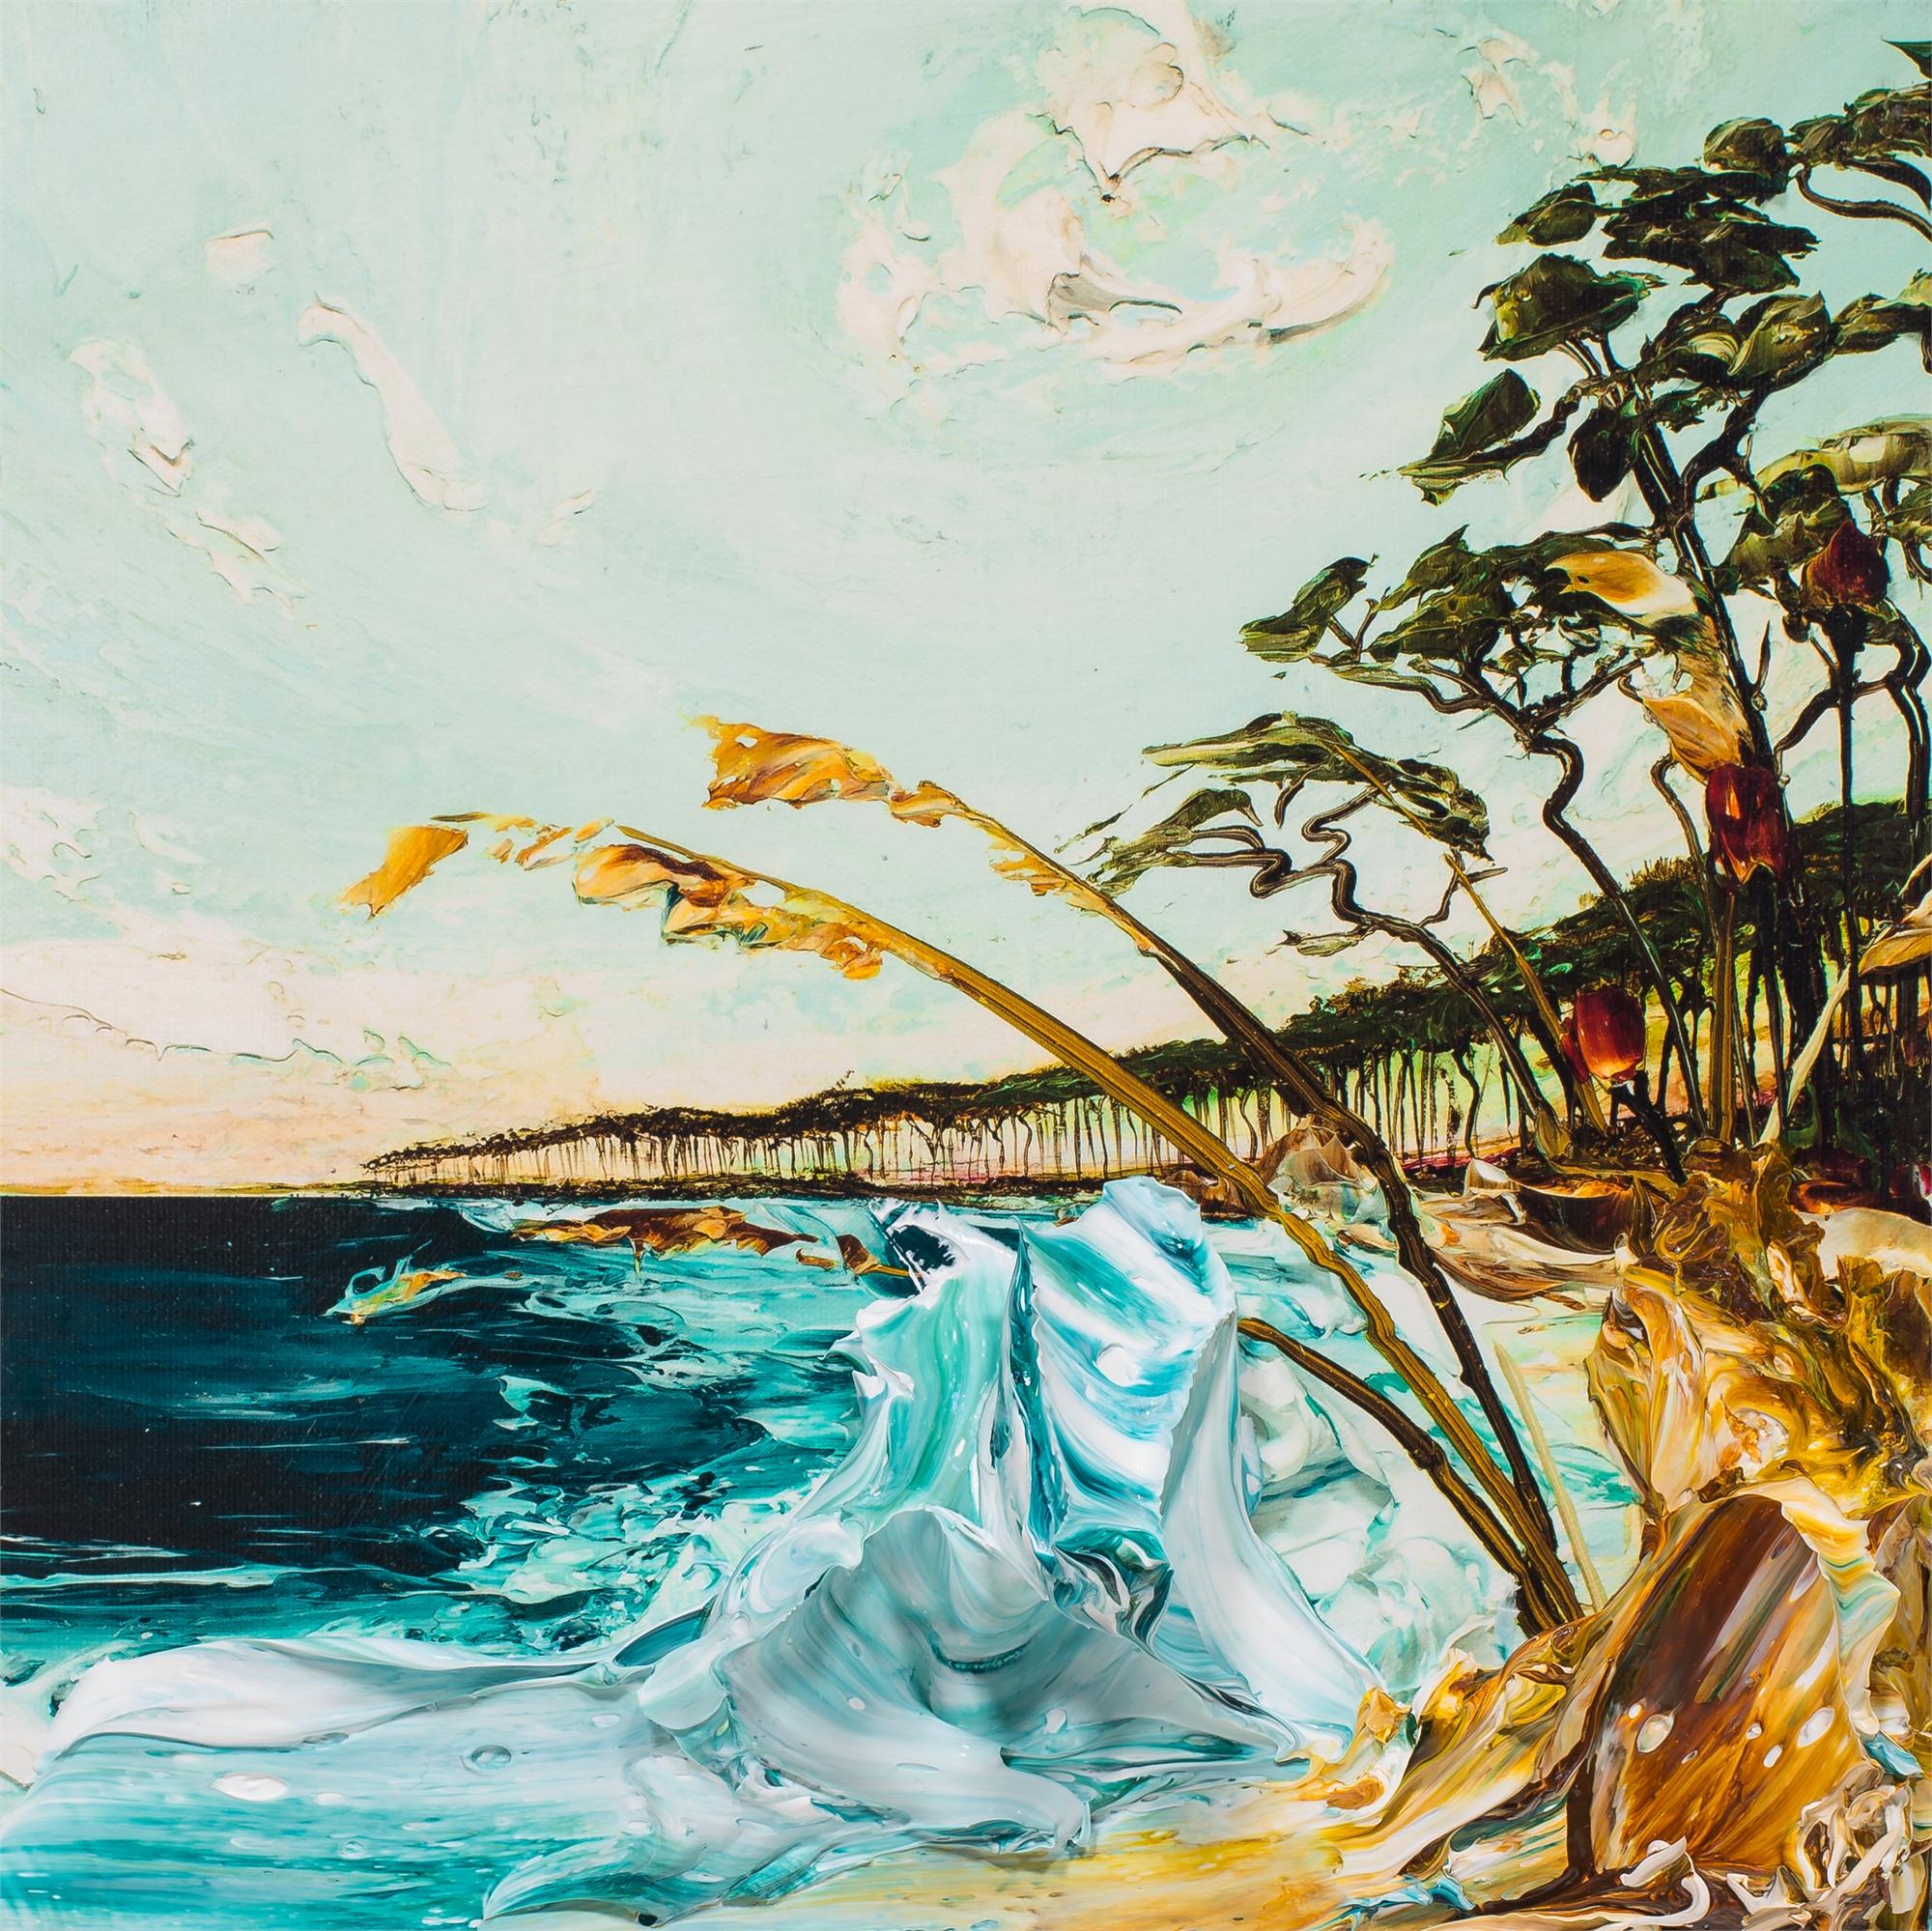 SEASCAPE HPAE 24/50 by Justin Gaffrey